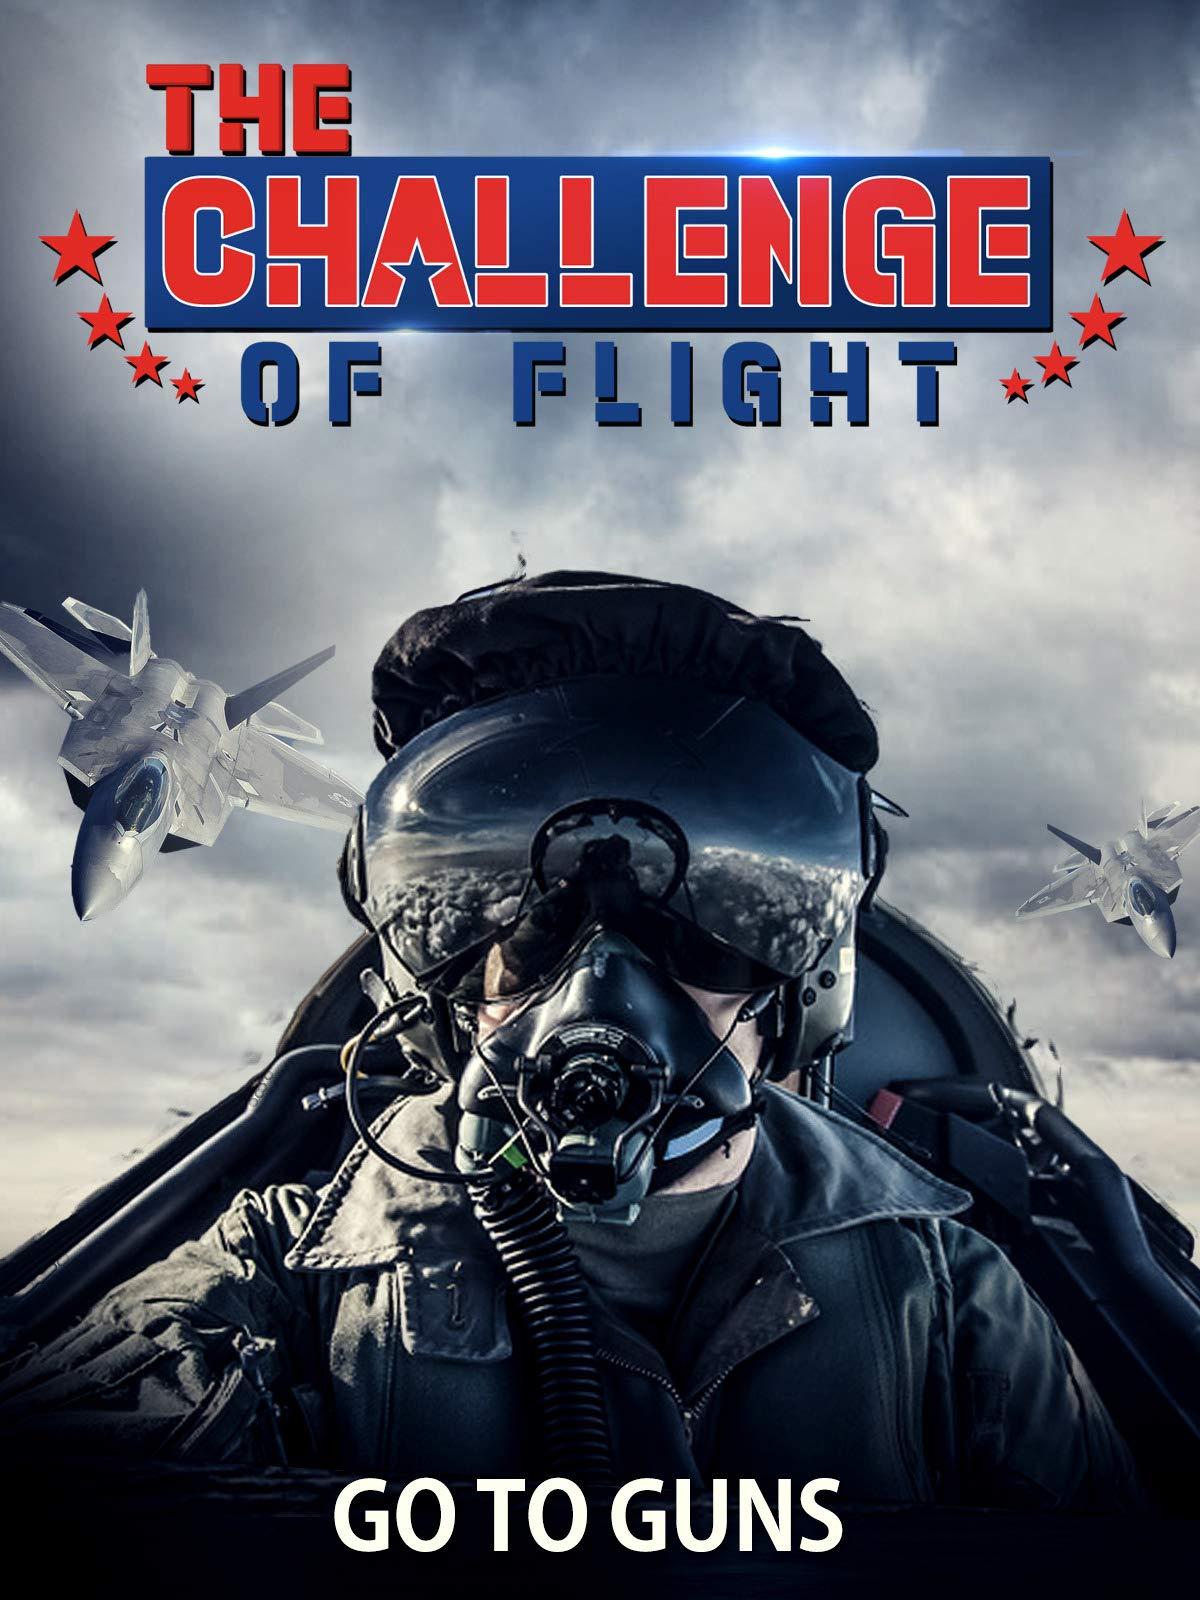 The Challenge of Flight - Go To Guns